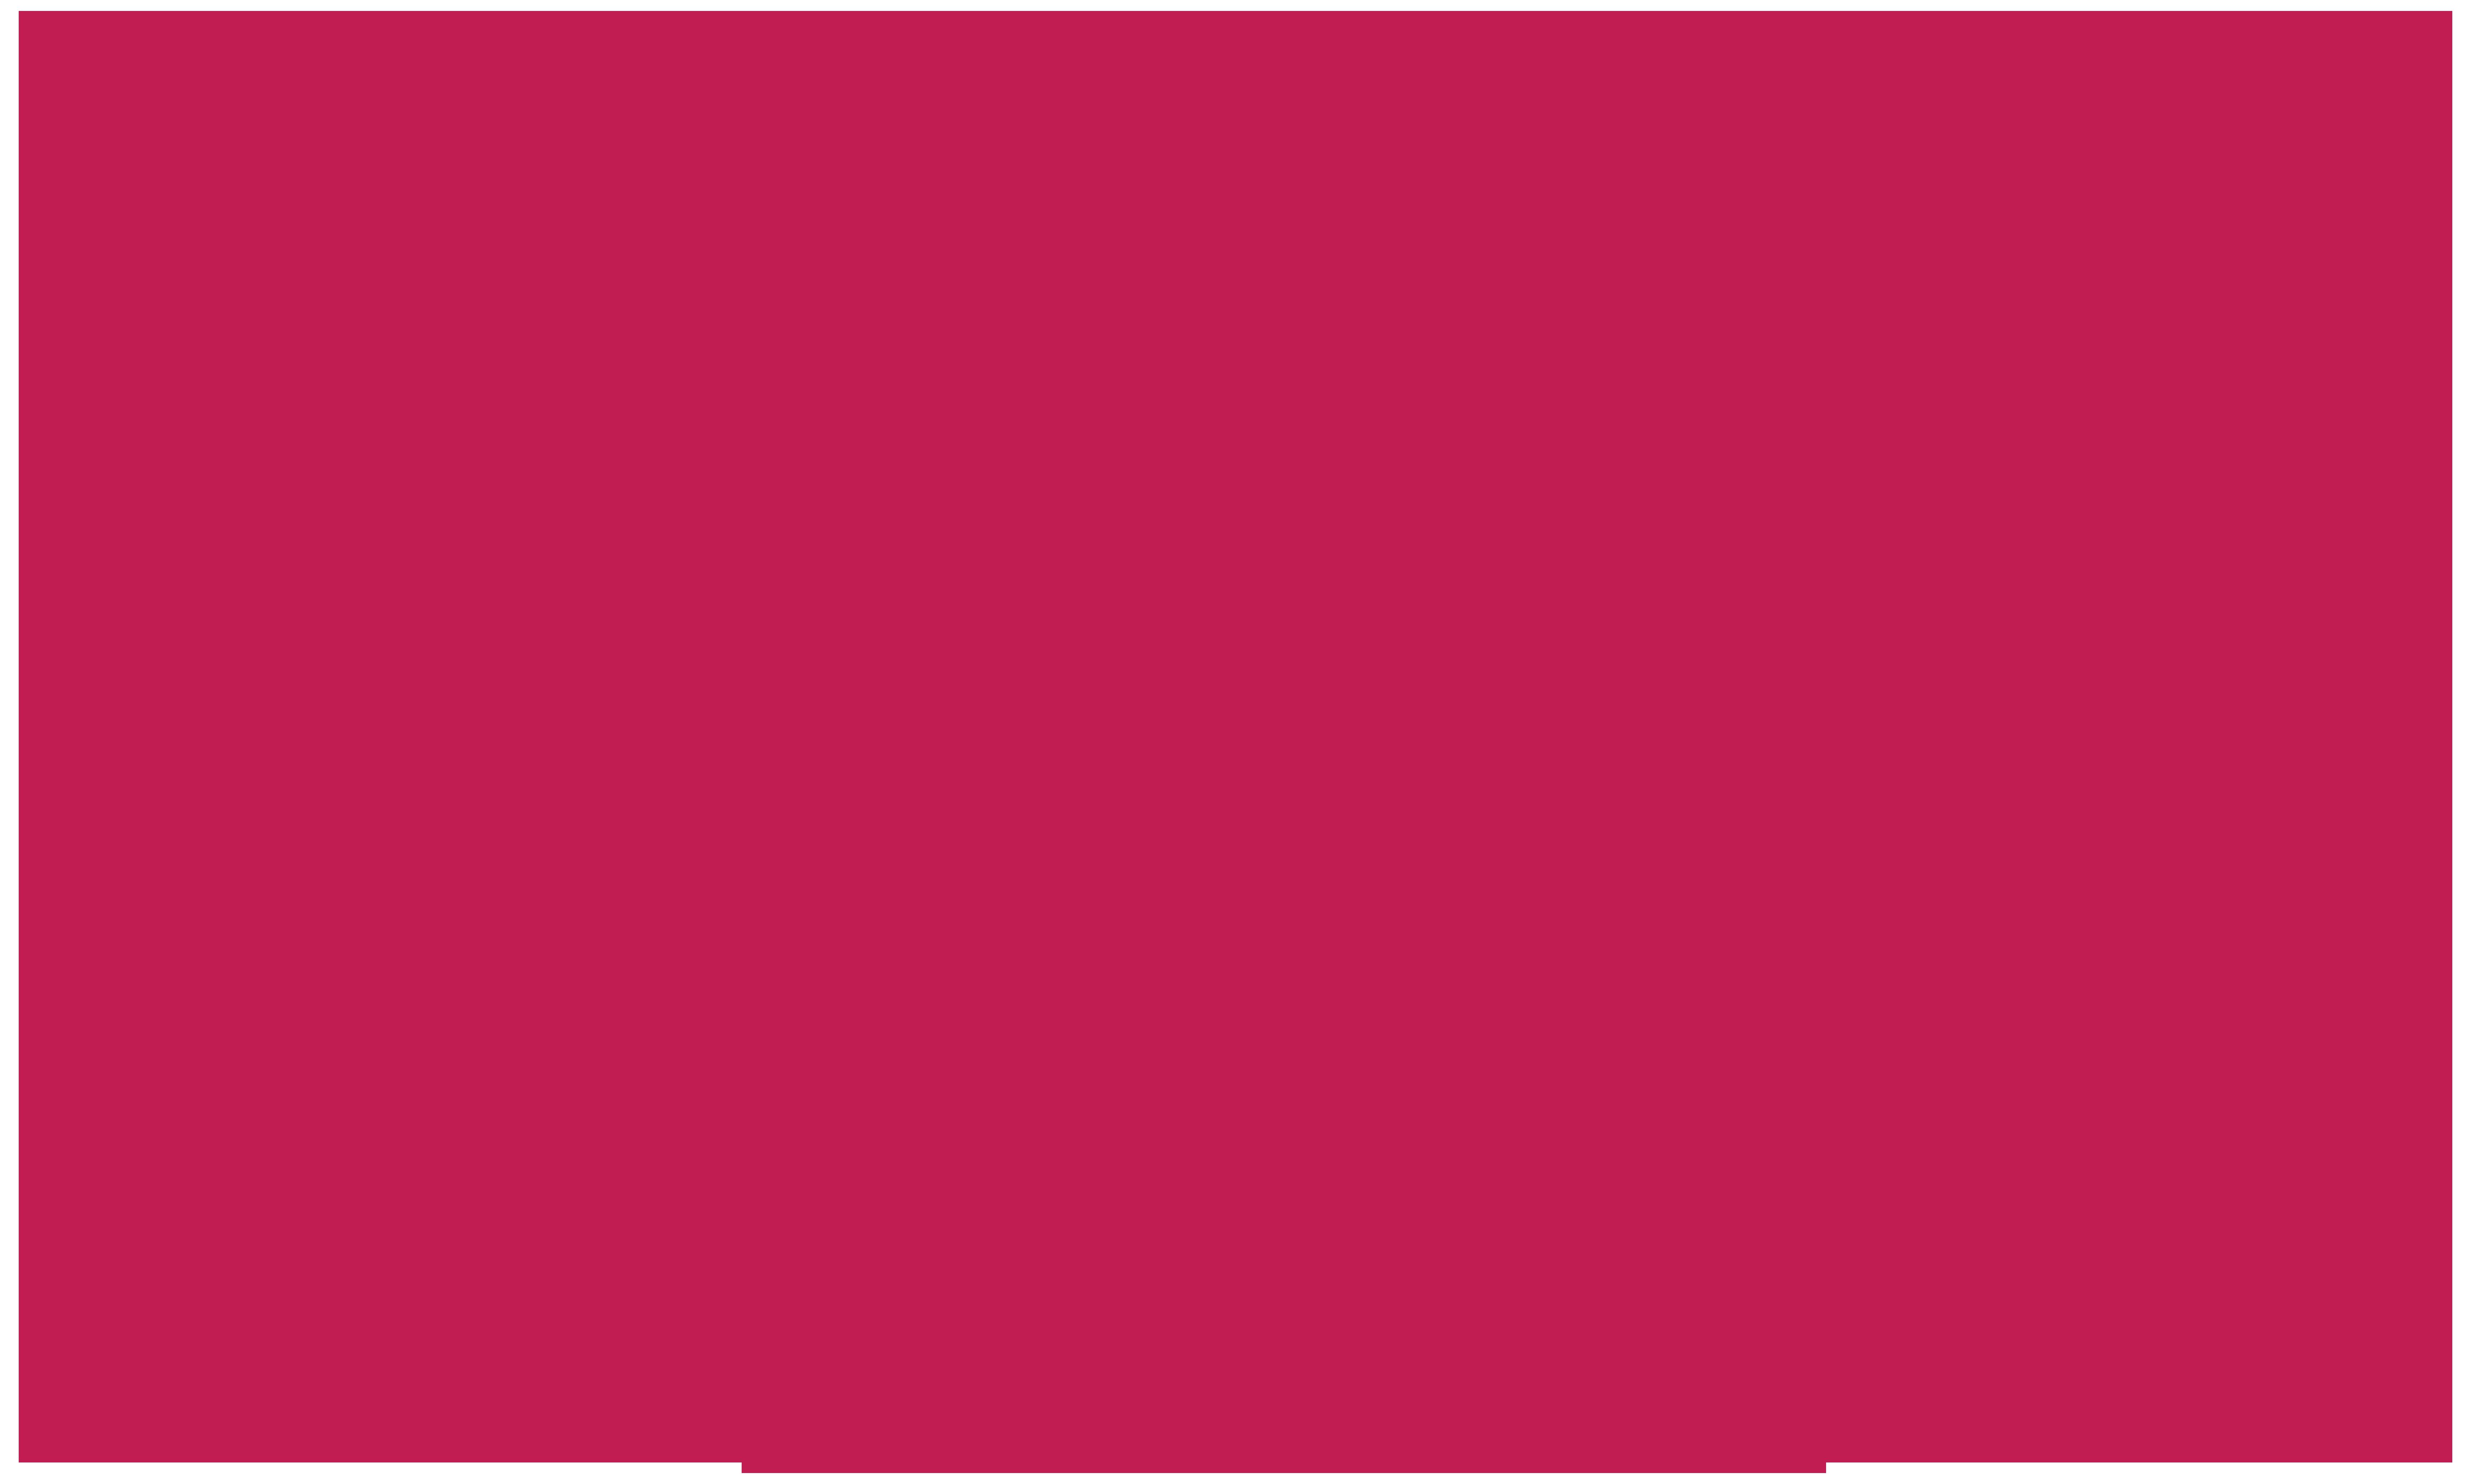 Pink Kiss Print PNG Clip Art PNG Image.